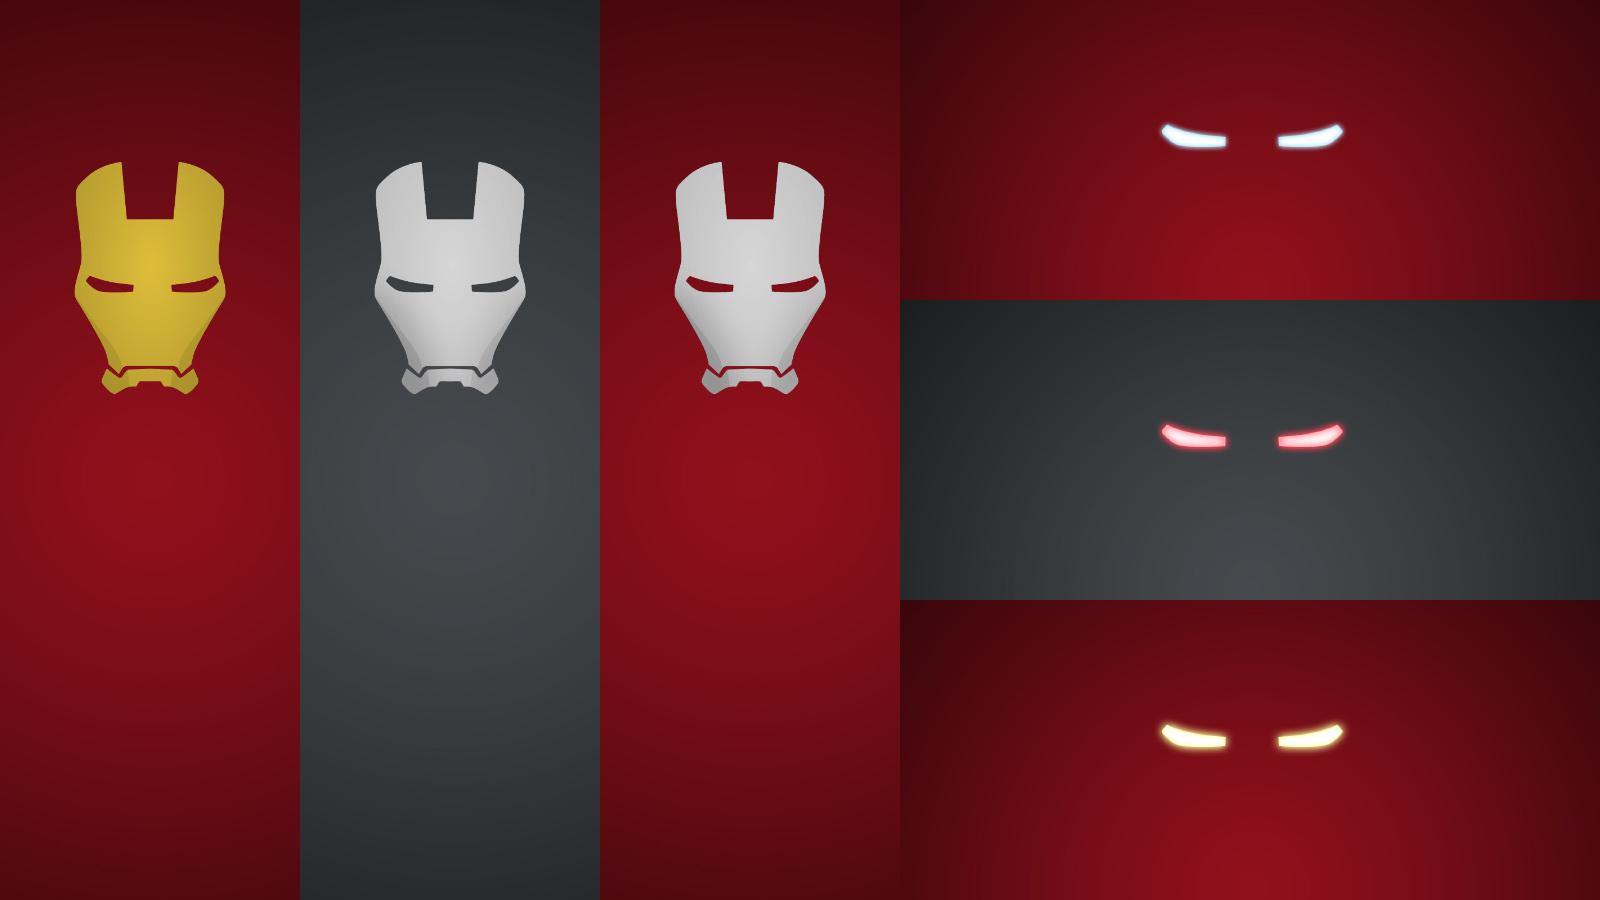 Minimalism iron man hd wallpaper free high definition for Define minimalist